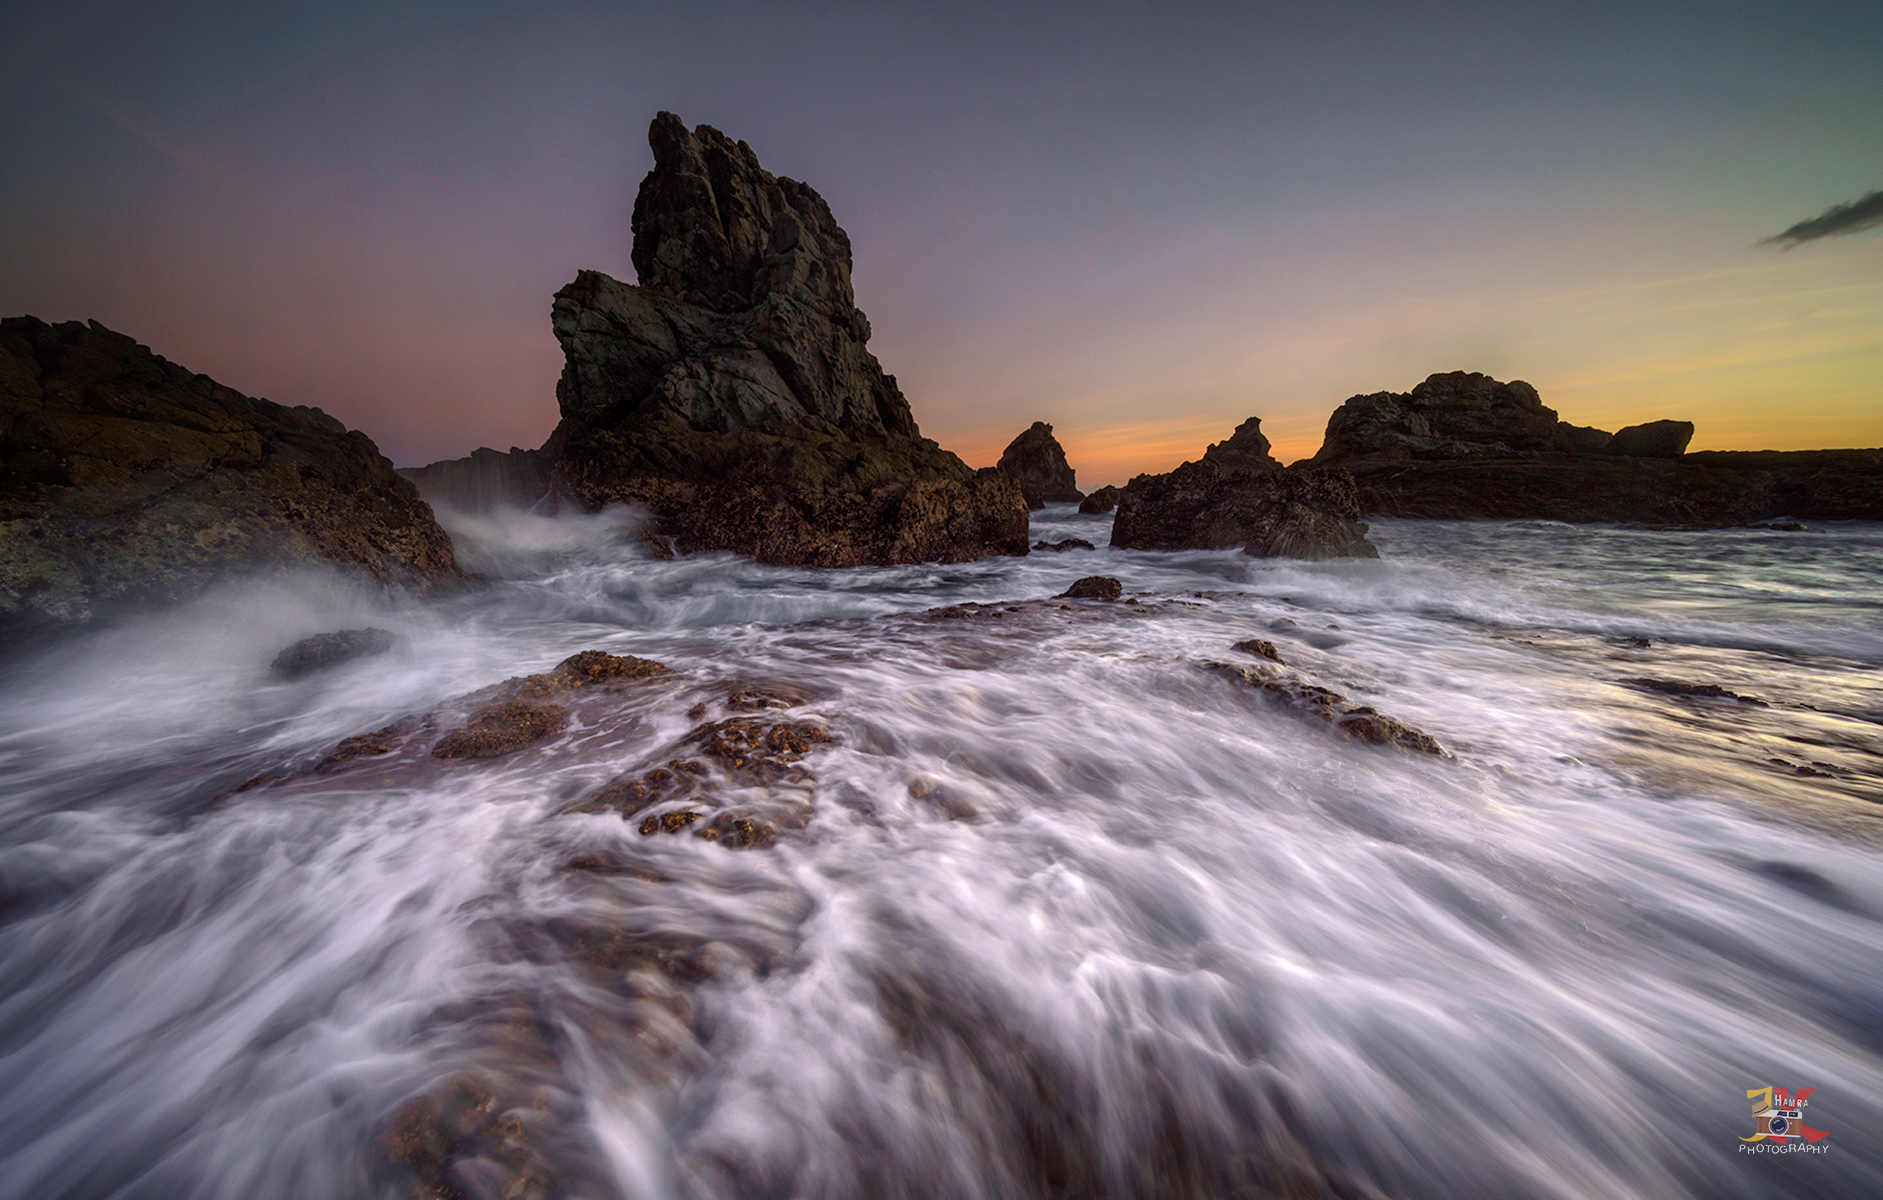 Sunset at Pantai Tampah, Indonesia